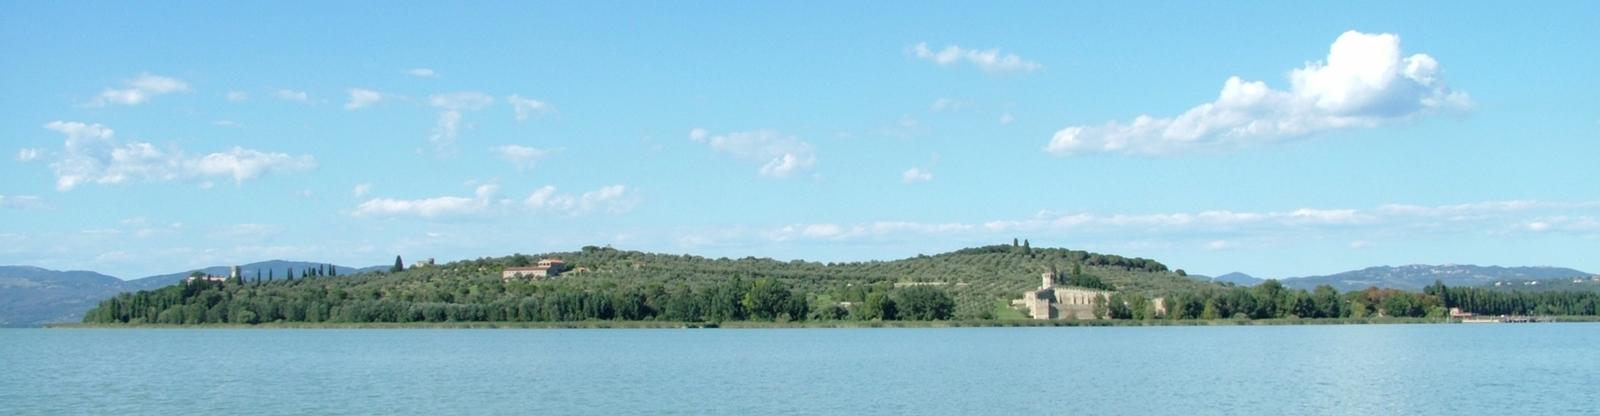 Isola Polvese e il Lago Trasimeno